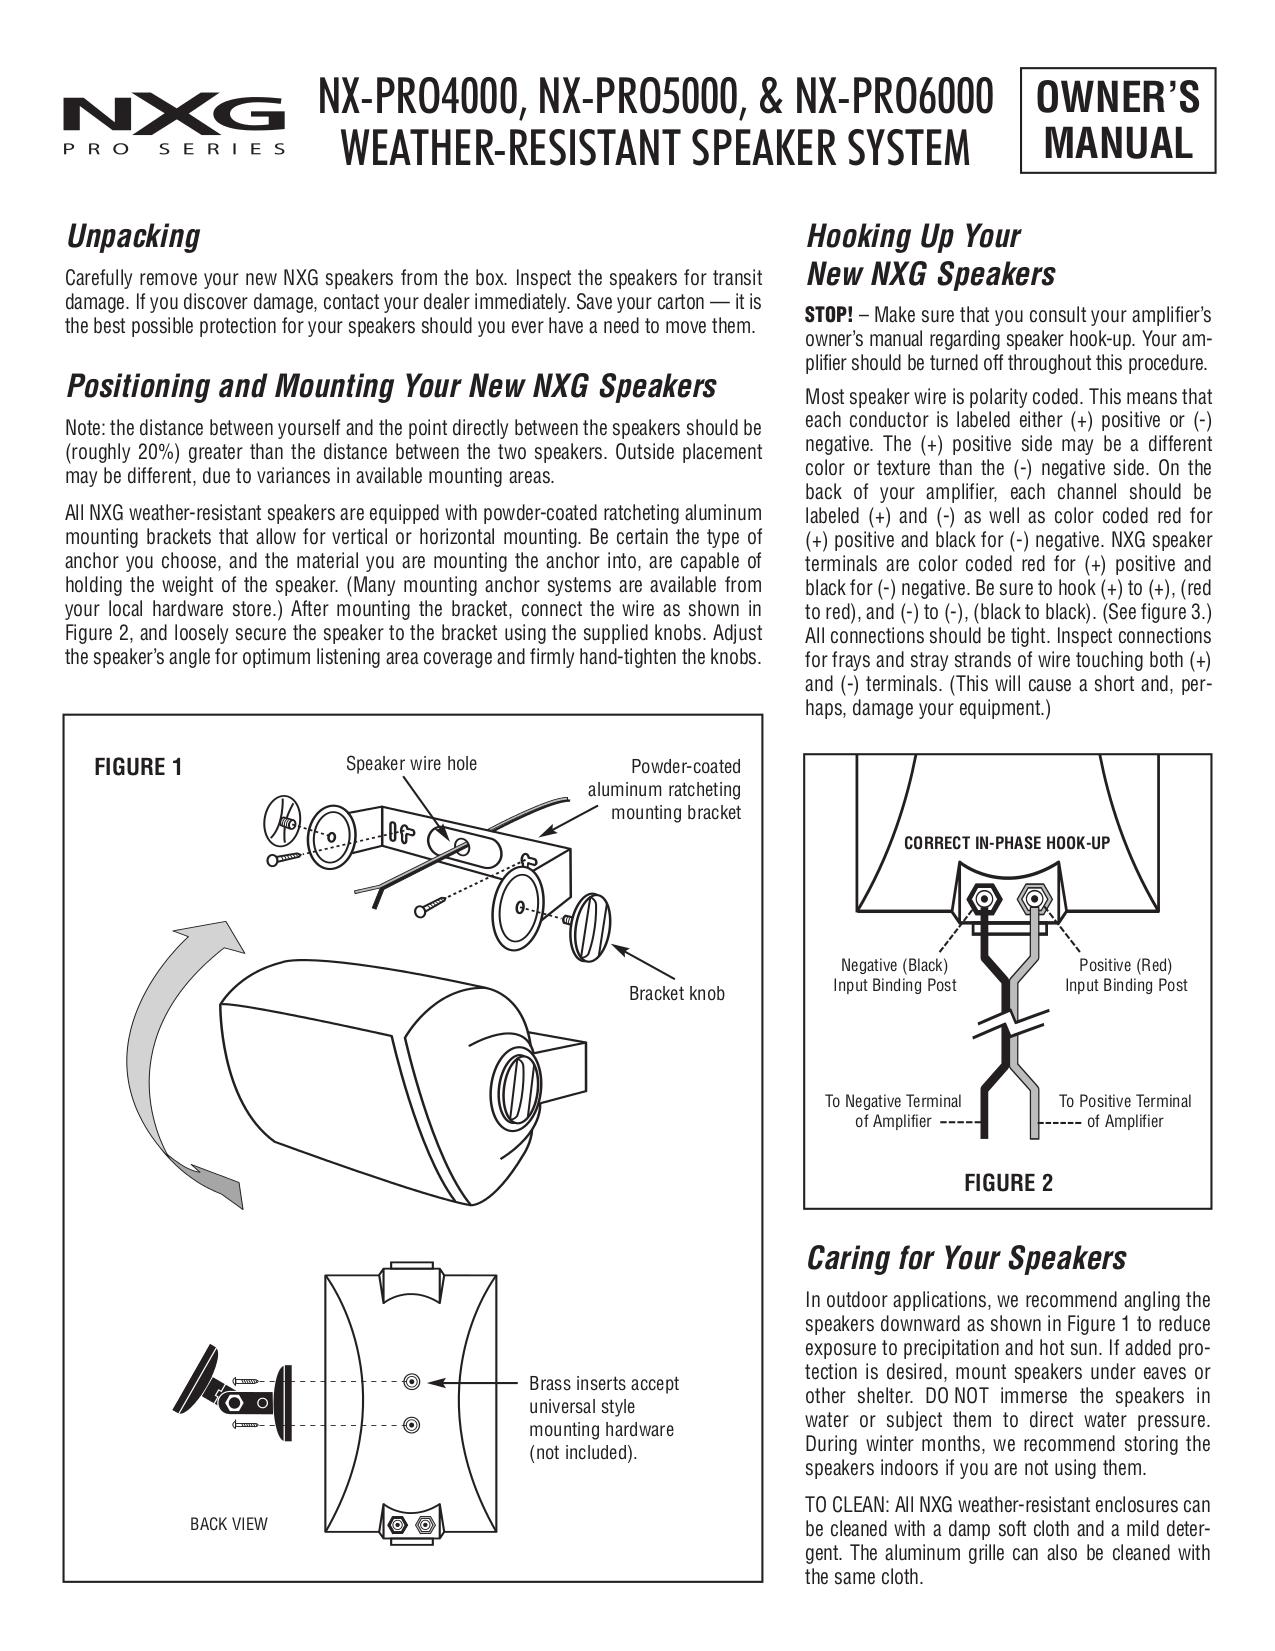 pdf for Nxg Speaker PRO 4000 manual